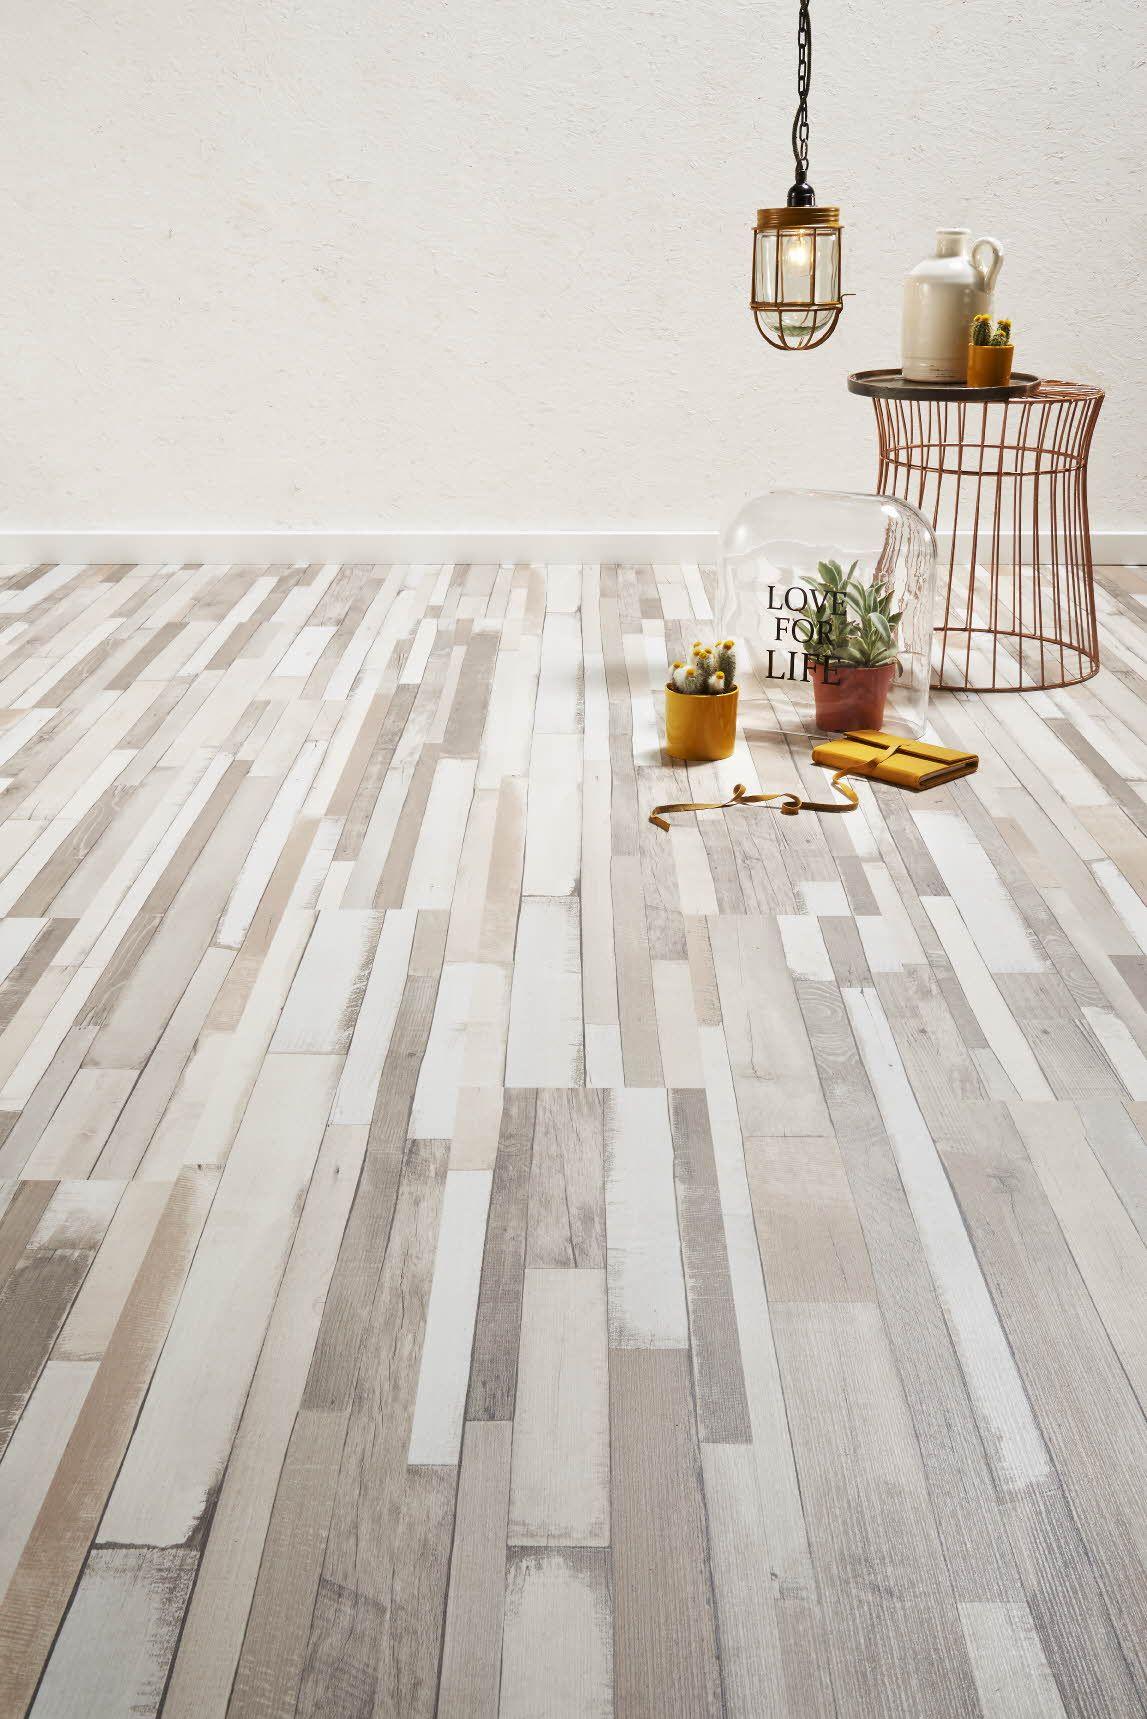 praxis de ode laminaat original century wood trondheim vloer